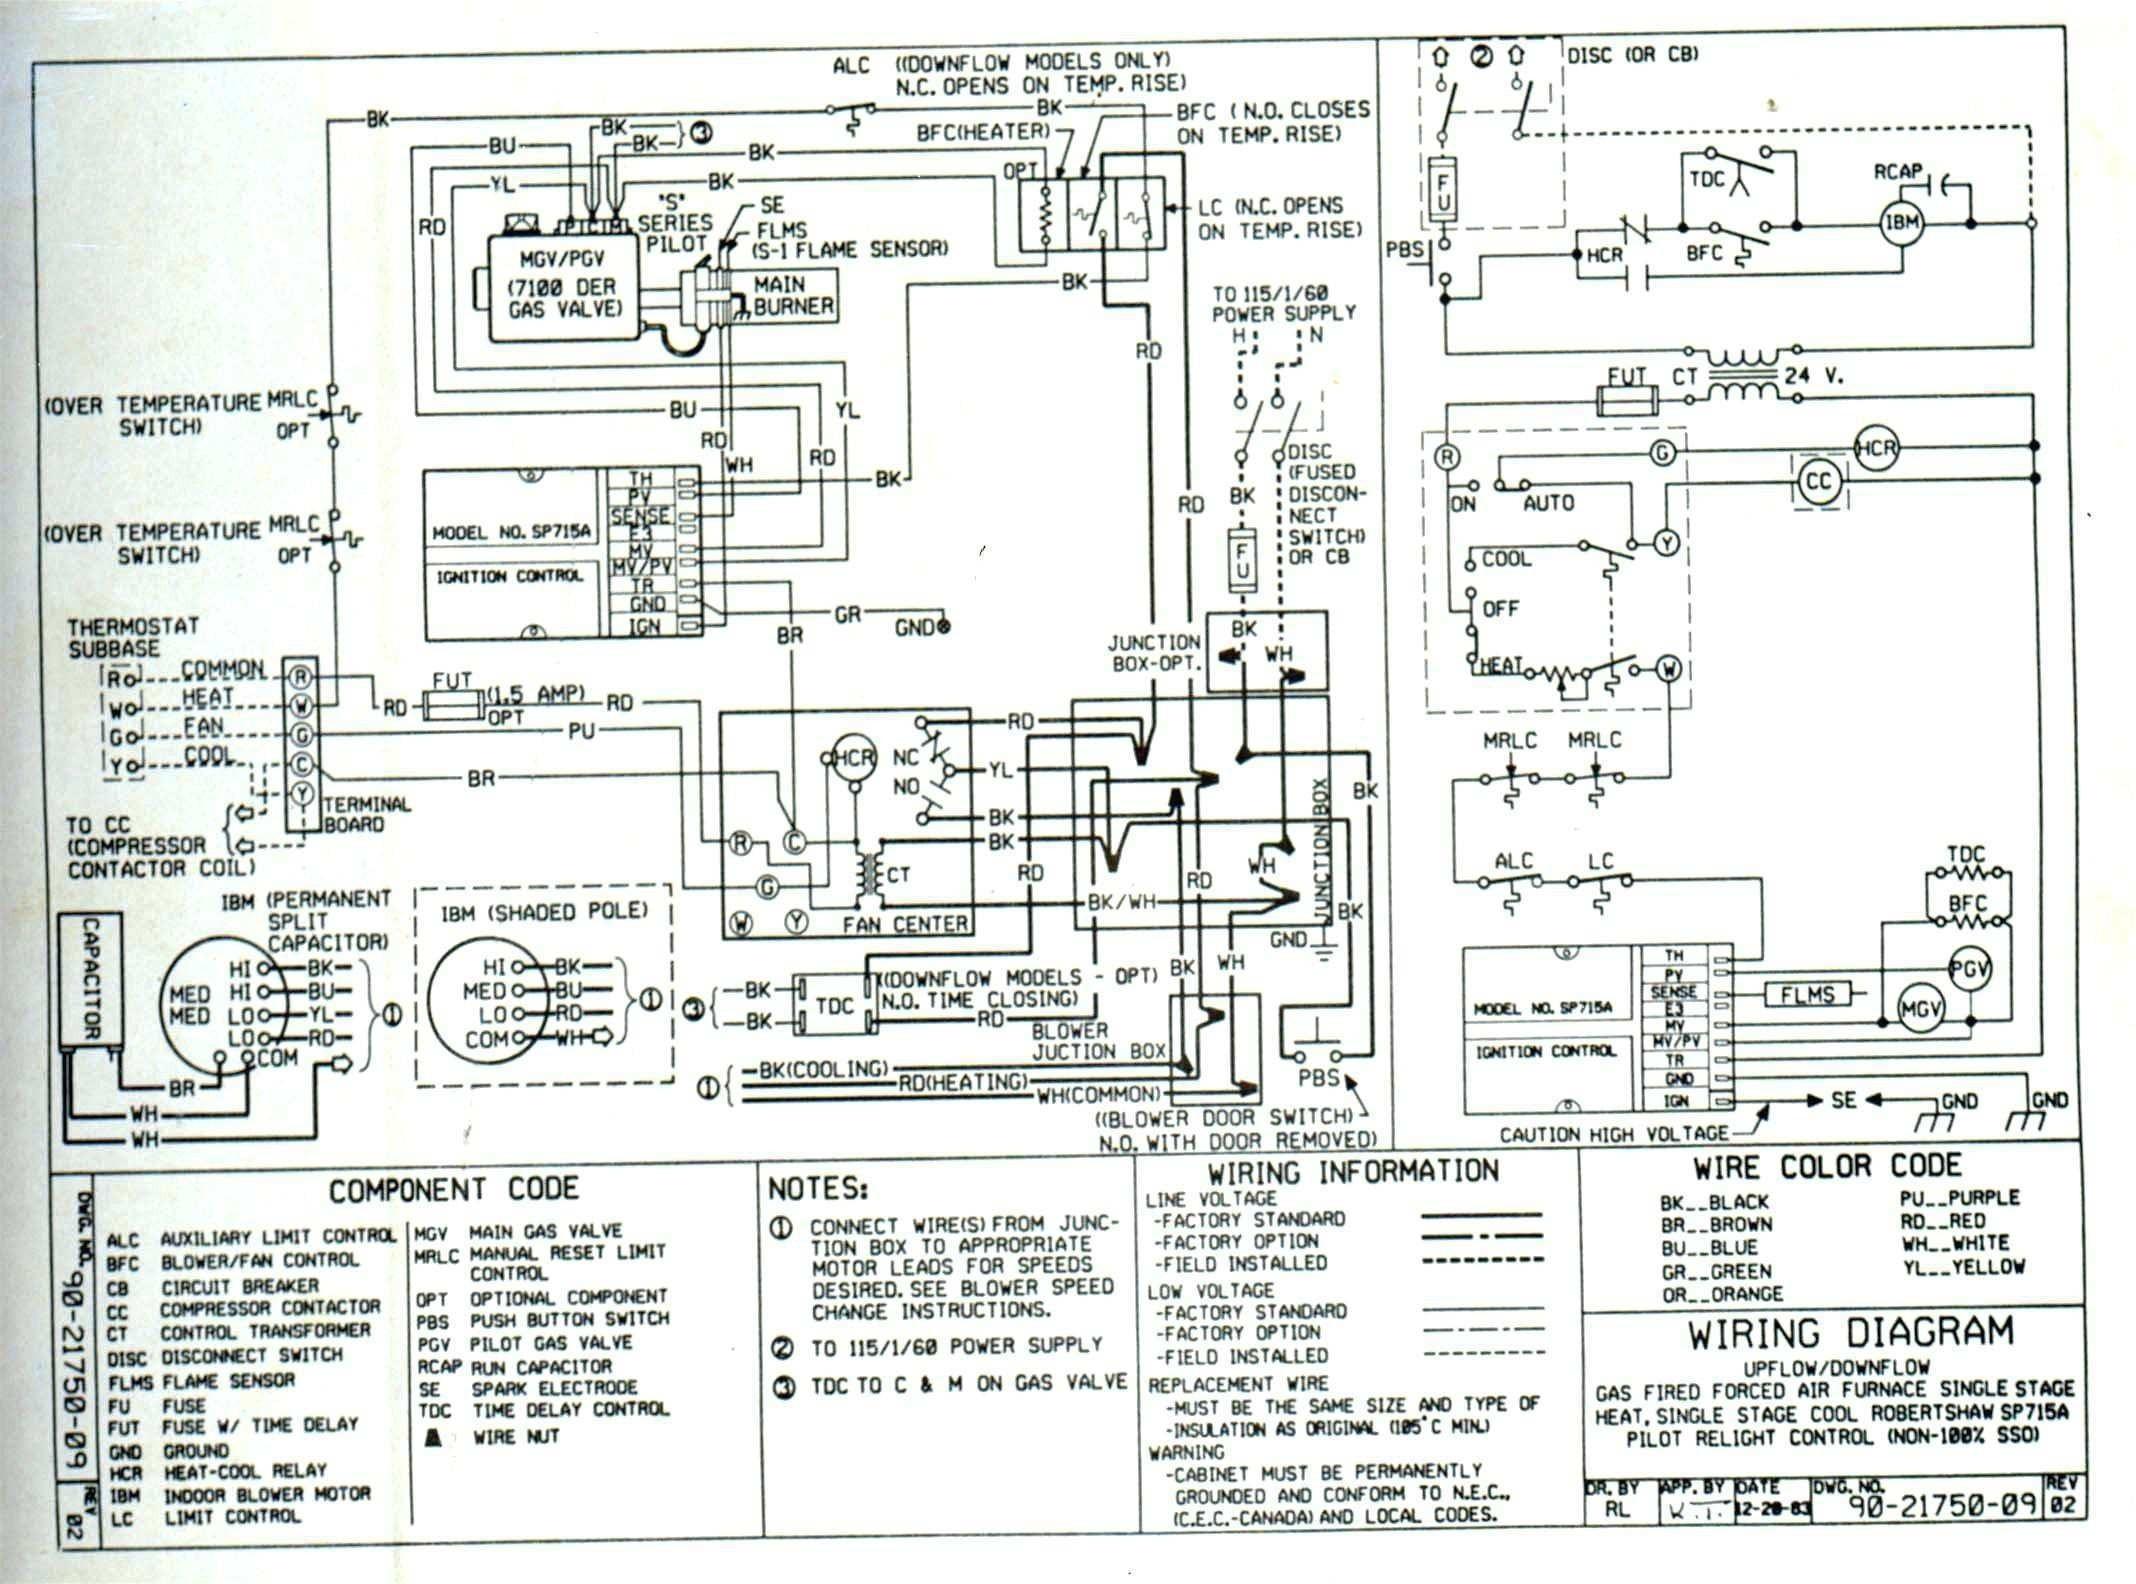 2 Pole Contactor Wiring Diagram Iec Wiring Diagram Example Fresh Wiring Diagram Contactor & 2 Pole Of 2 Pole Contactor Wiring Diagram